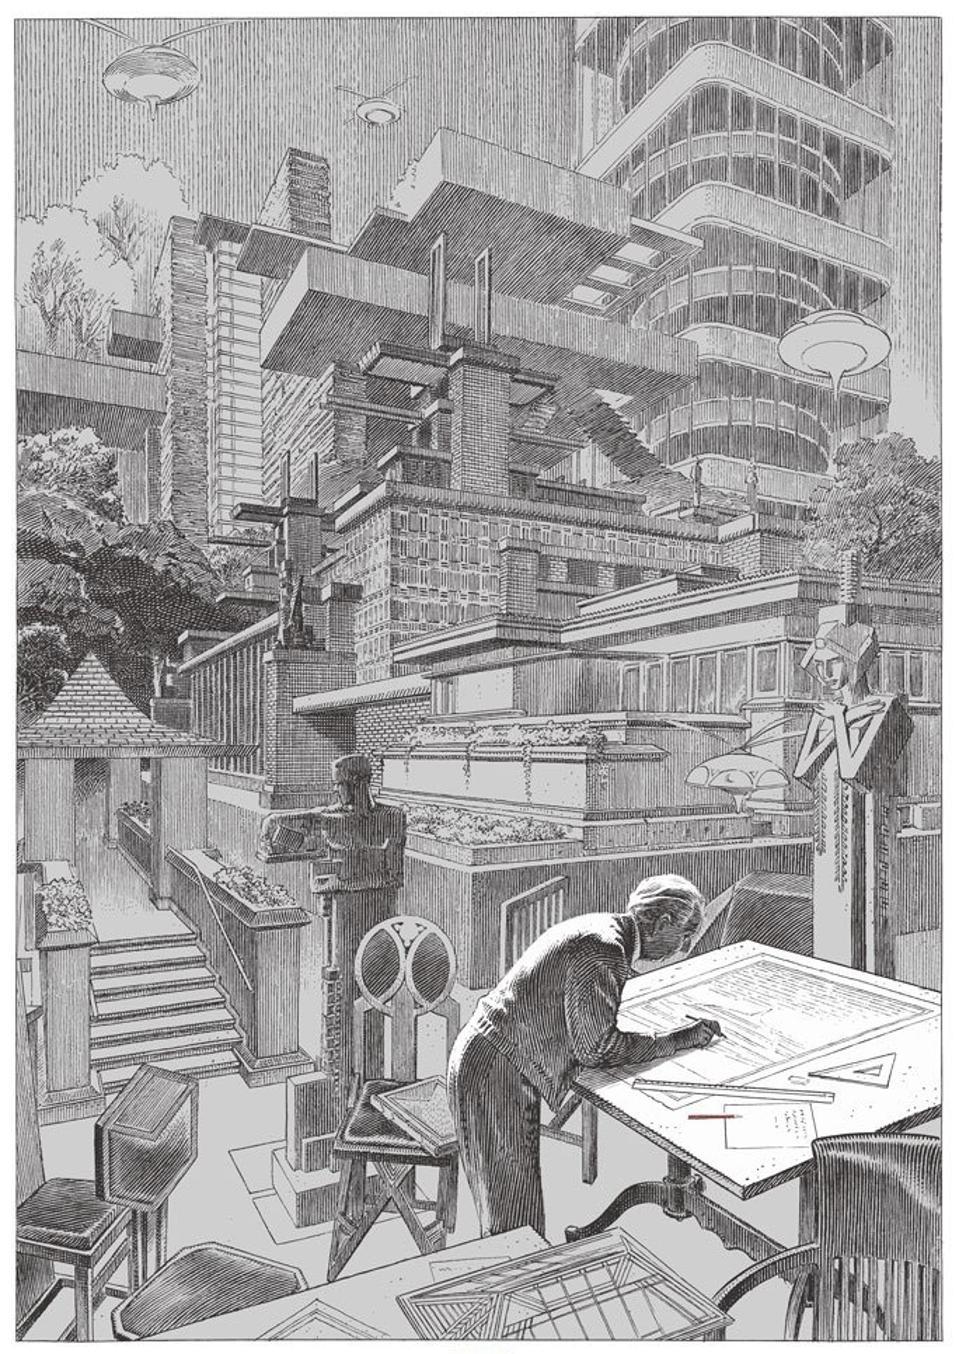 François Schuiten, ″Hommage to Frank Lloyd Wright″